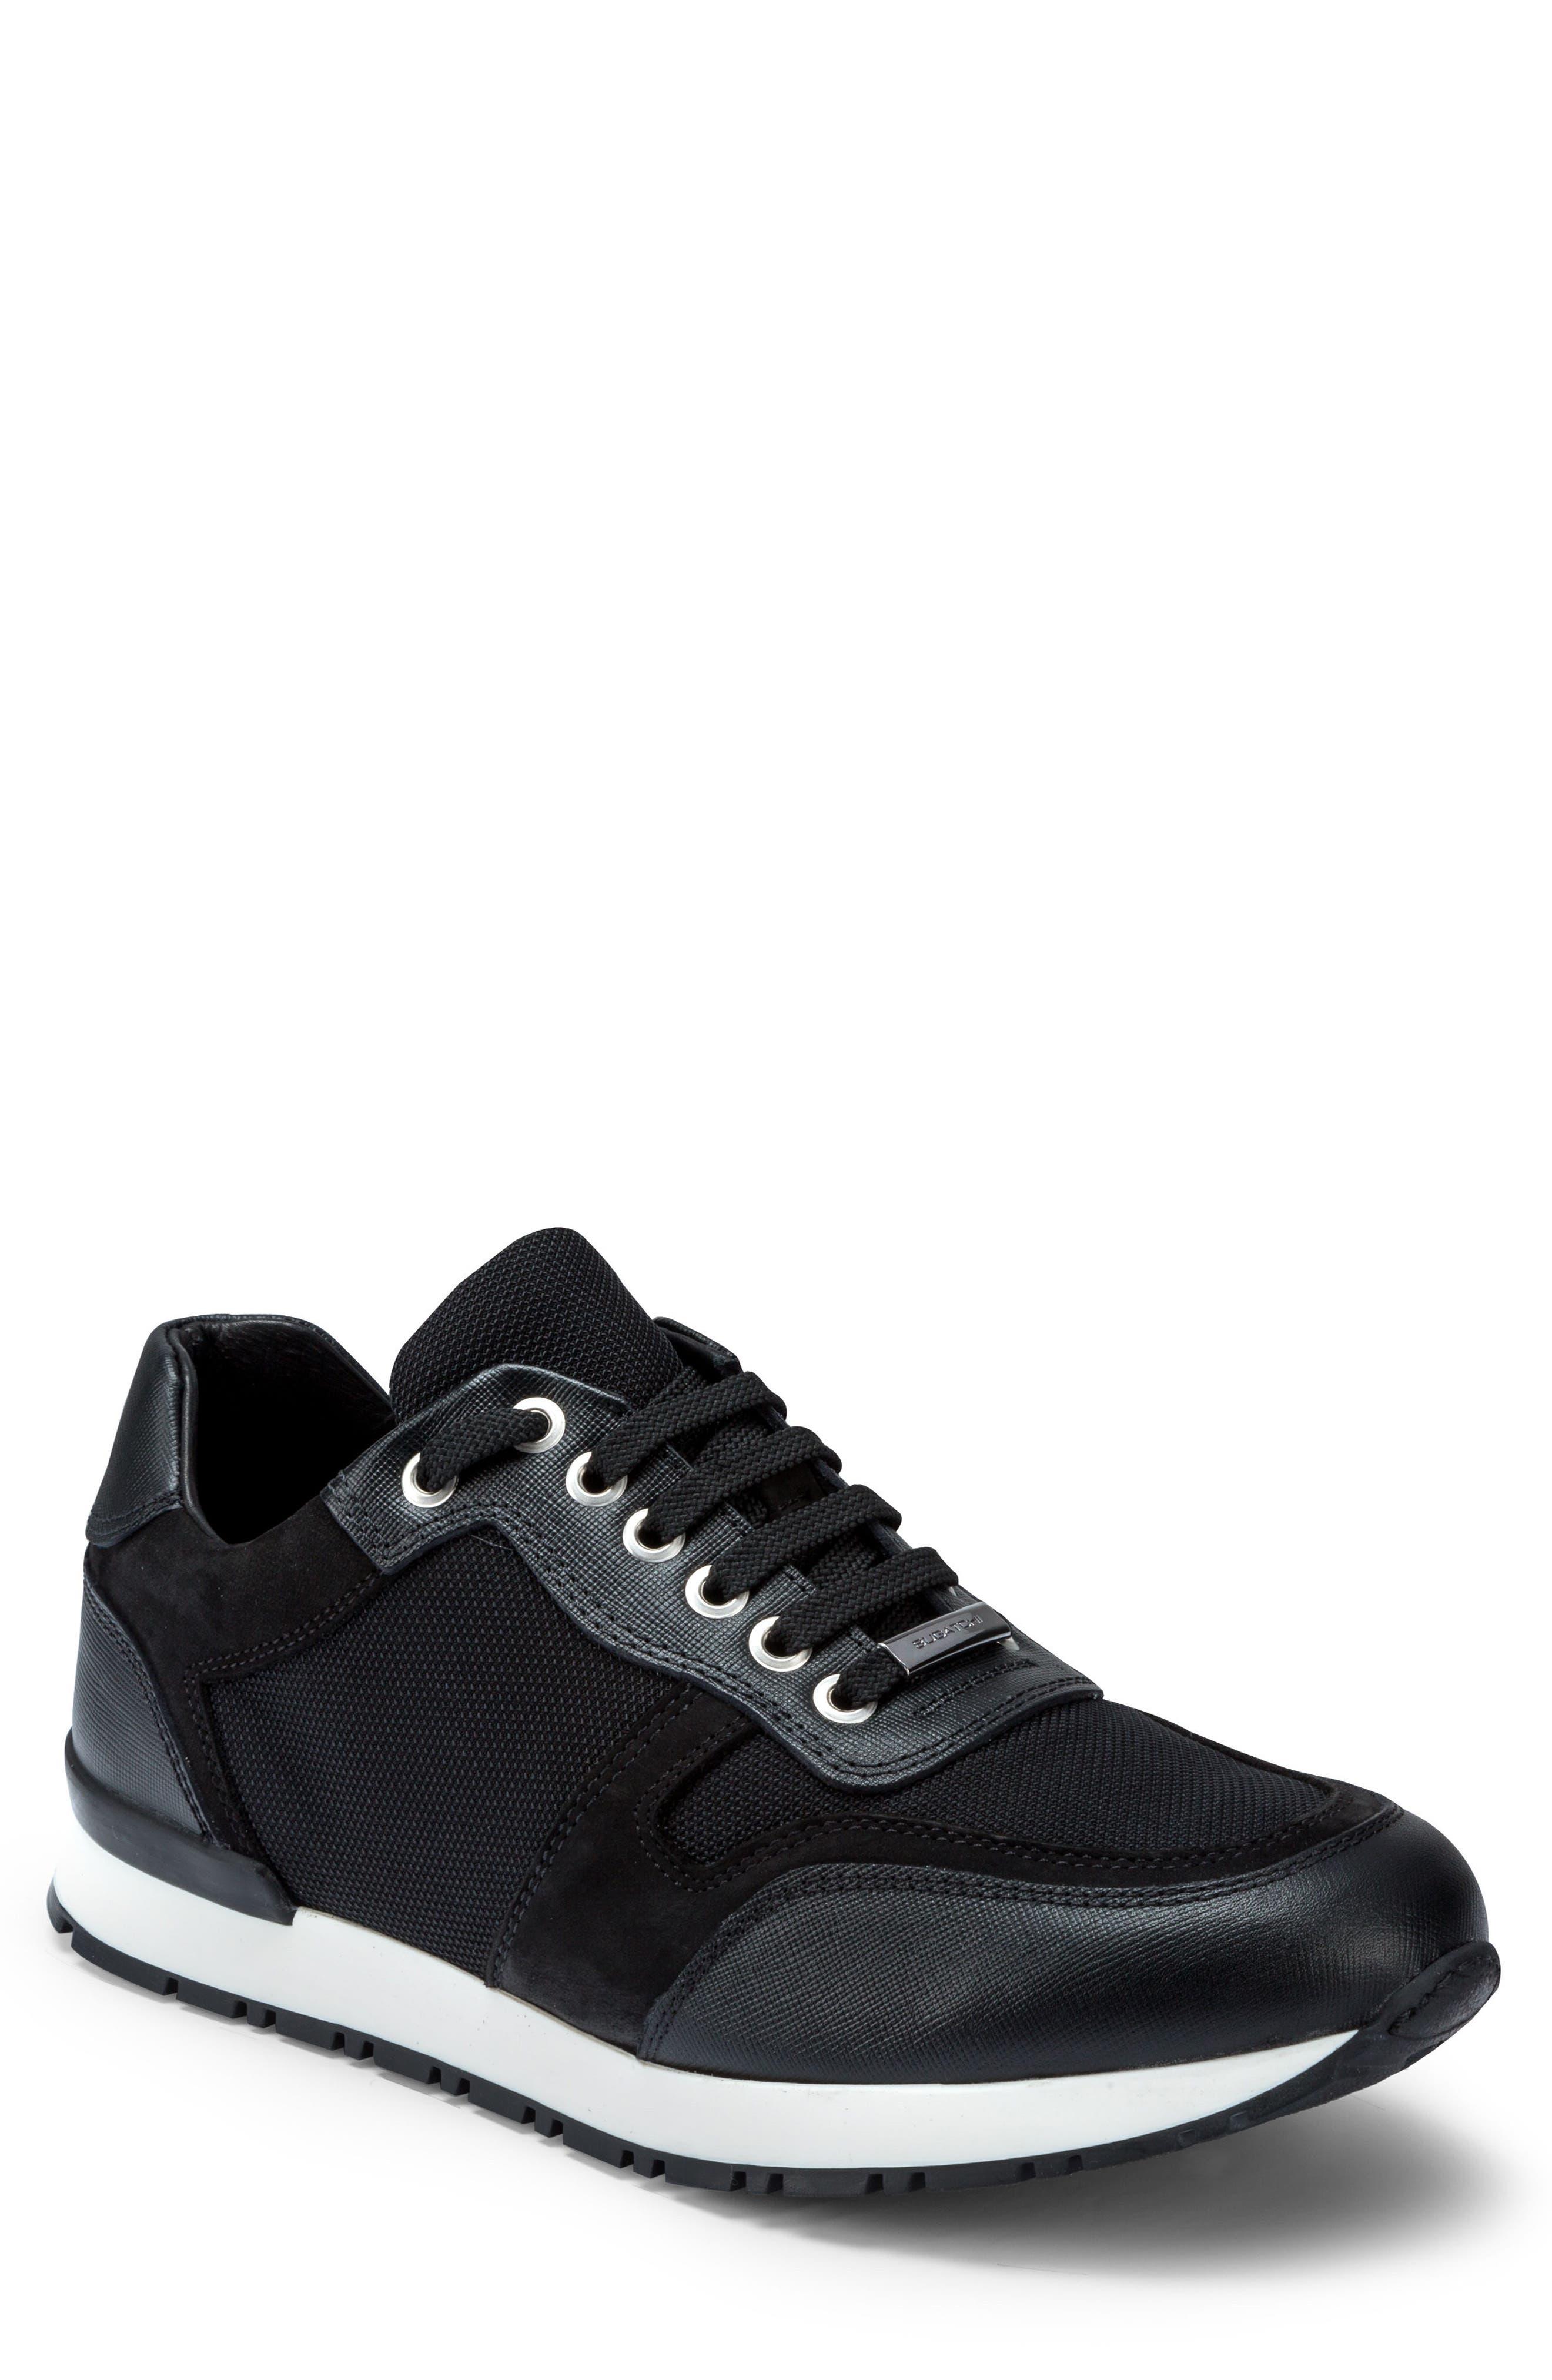 Modena Sneaker,                         Main,                         color, 001